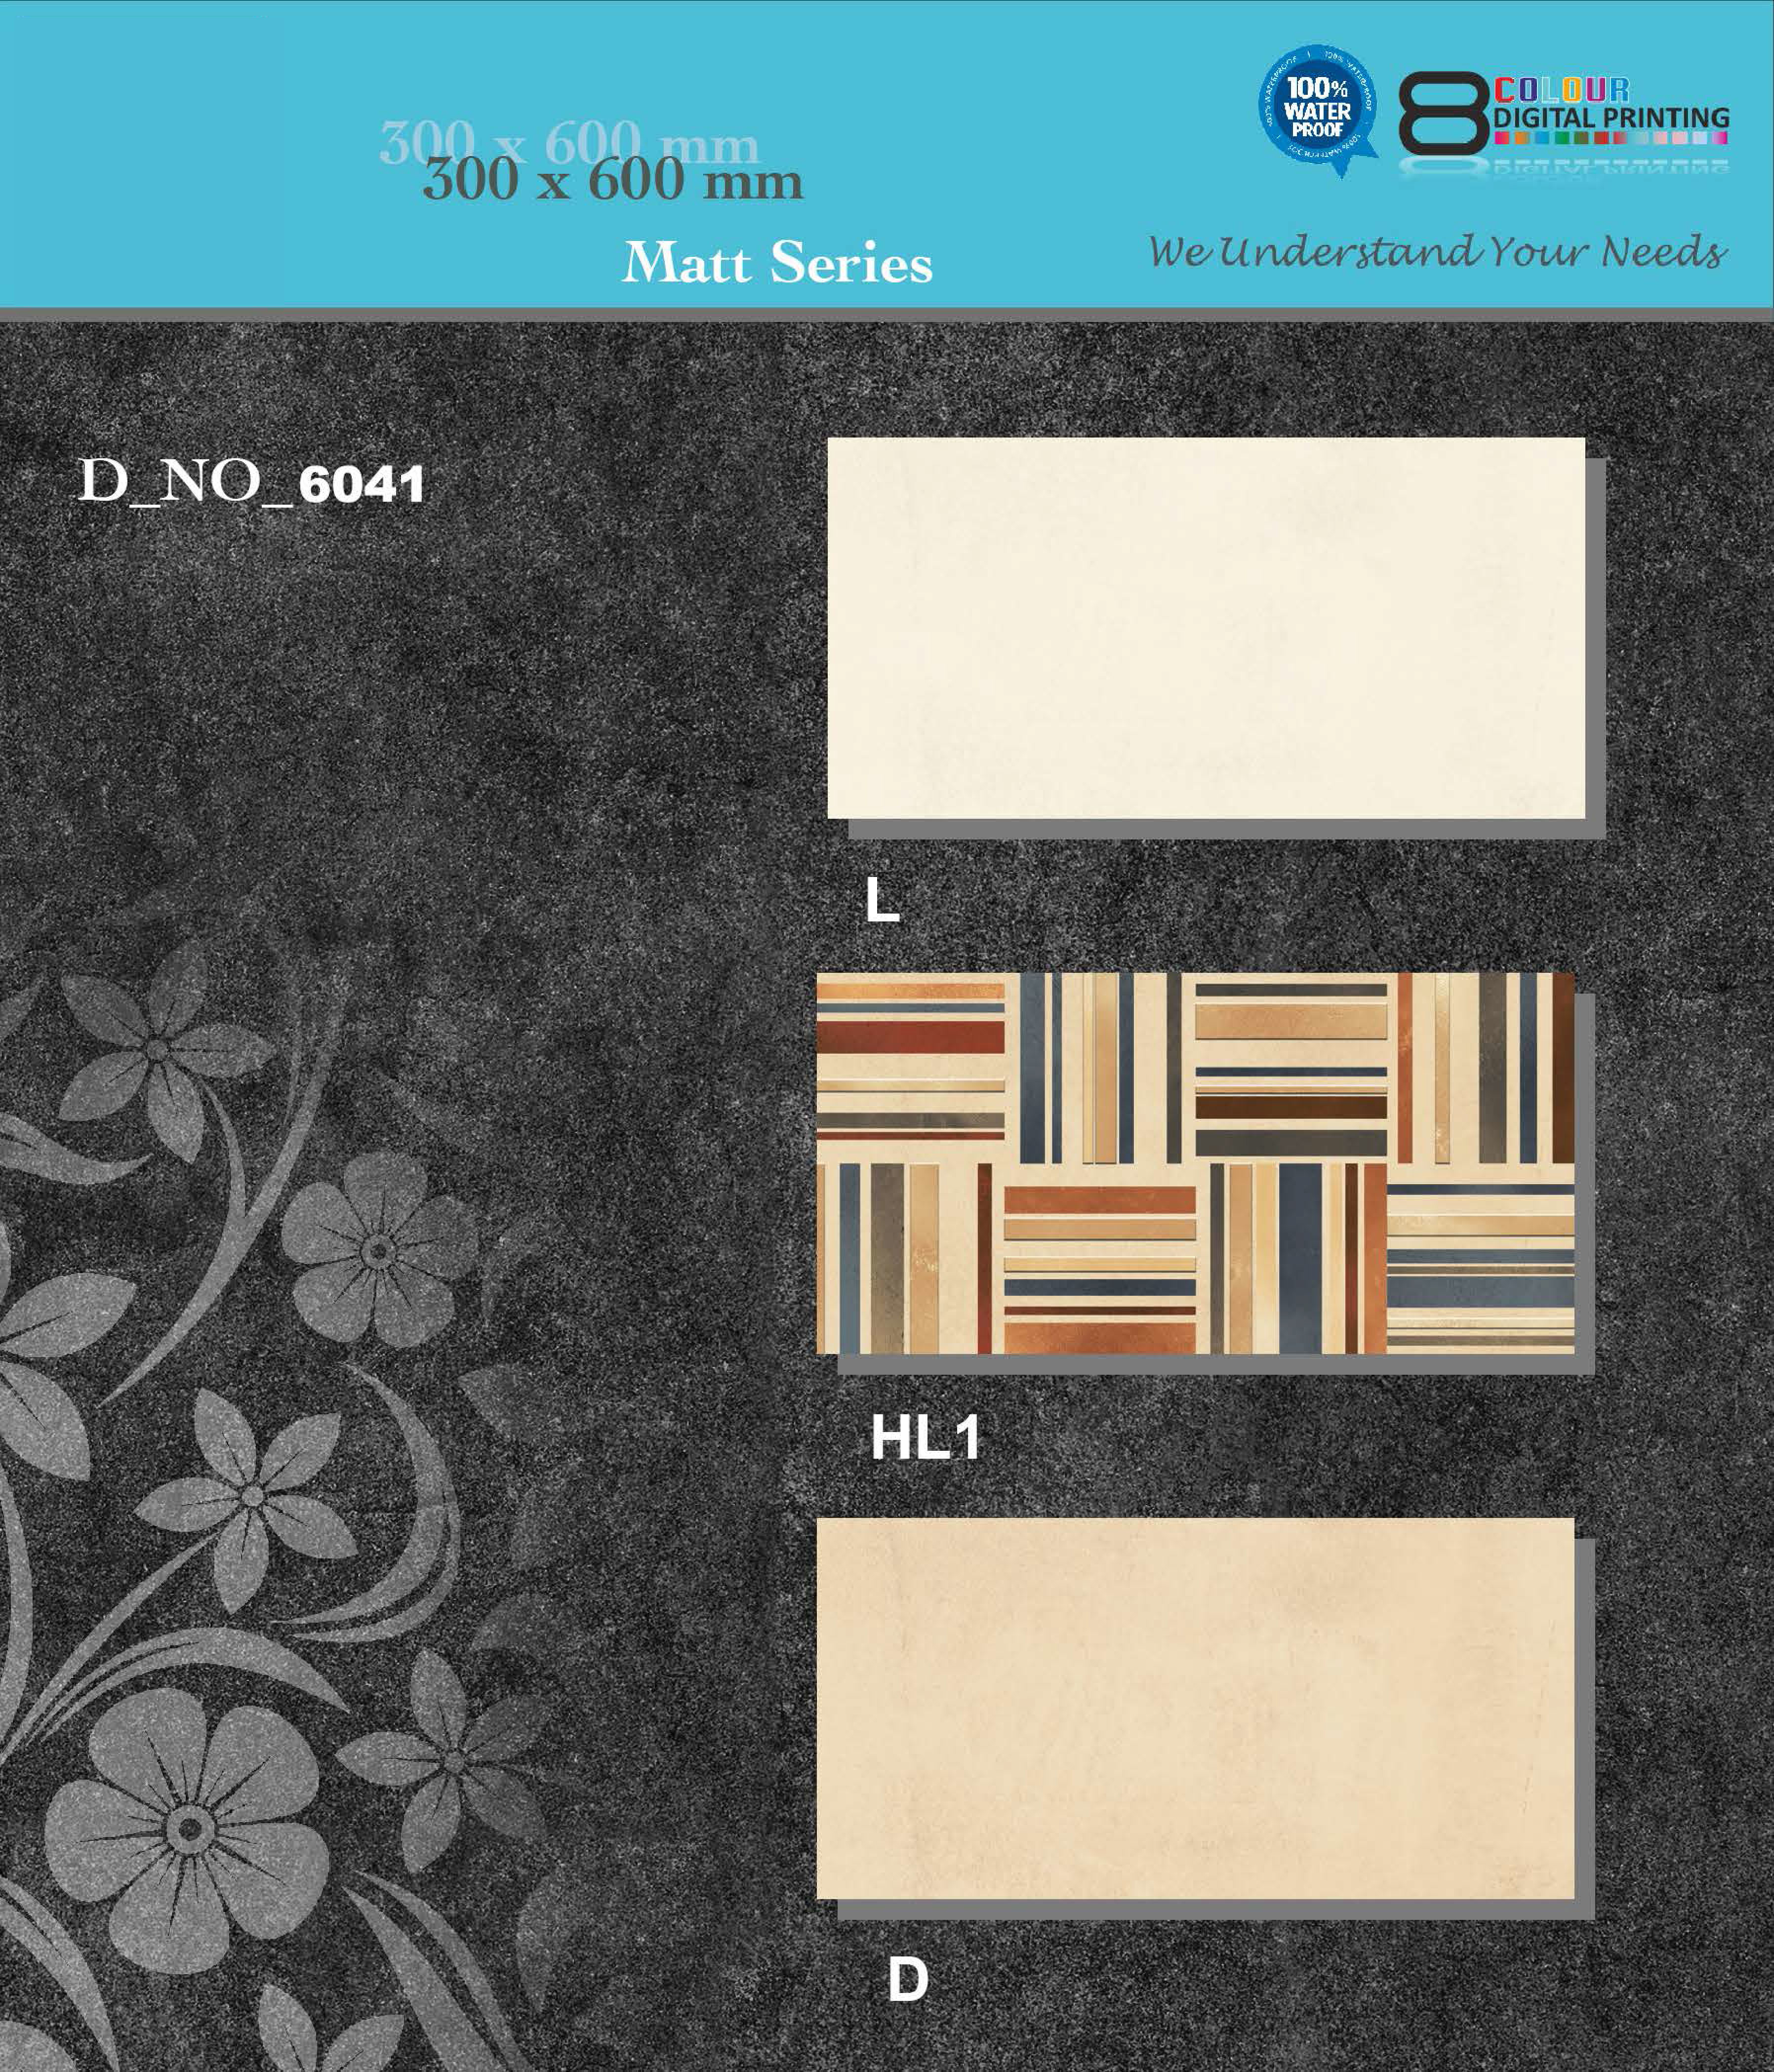 Matt Ceramic Wall Tiles 300x600 MM